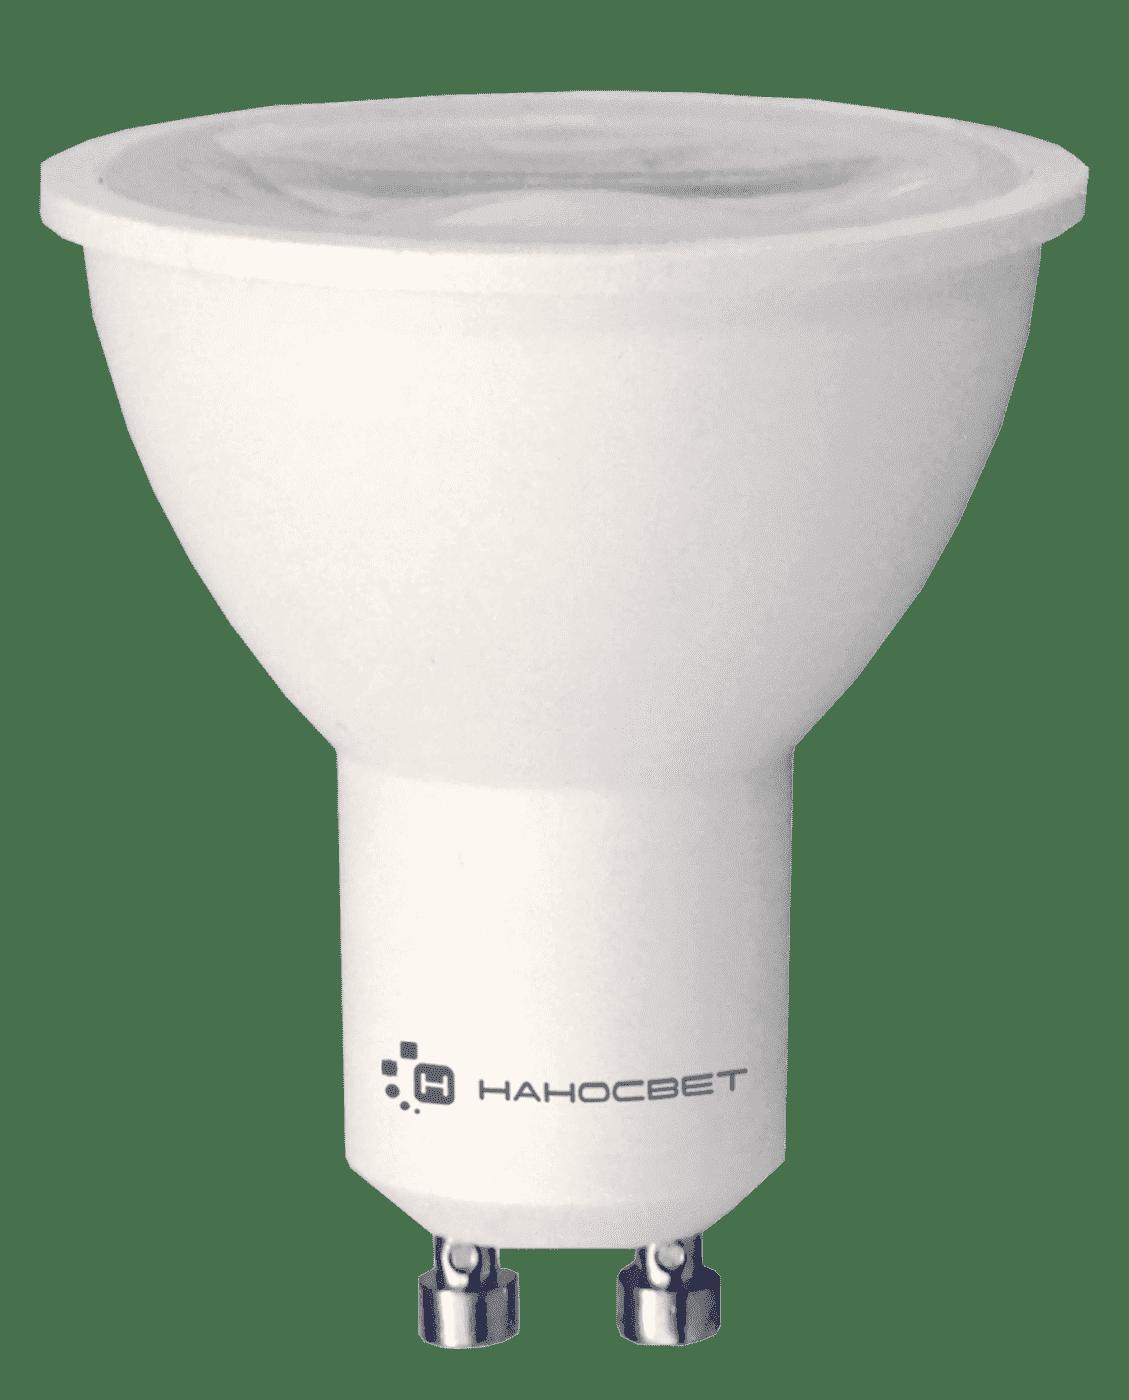 Светодиодная лампа НАНОСВЕТ LH-MR16-8.5/GU10/827 арт. L282